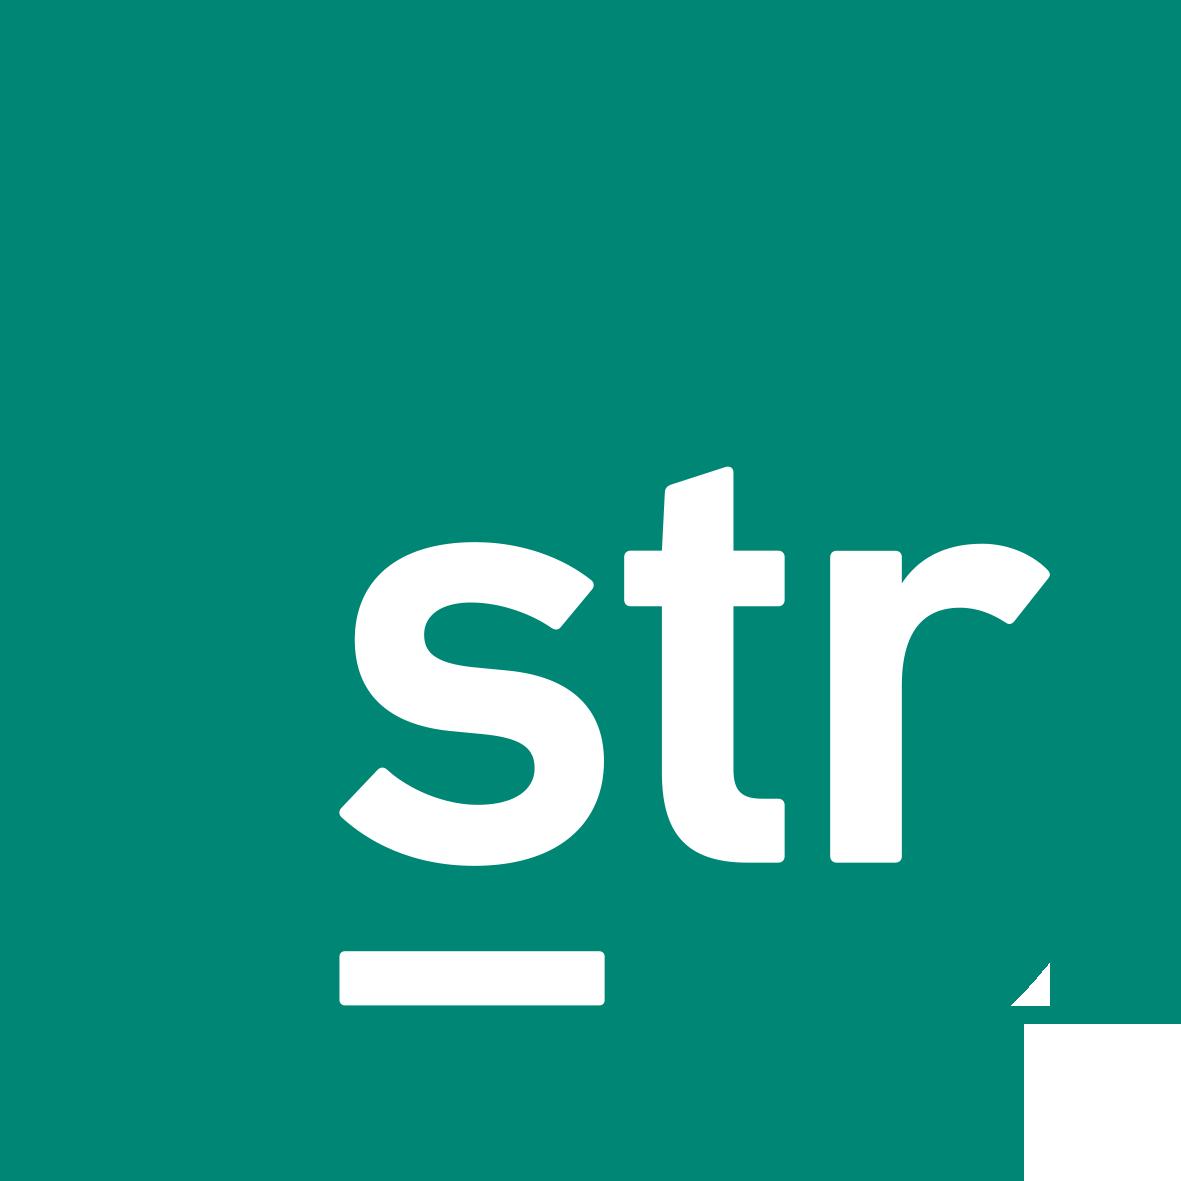 File:STR FLAT TEAL WHITE RGB 300dpi.png.